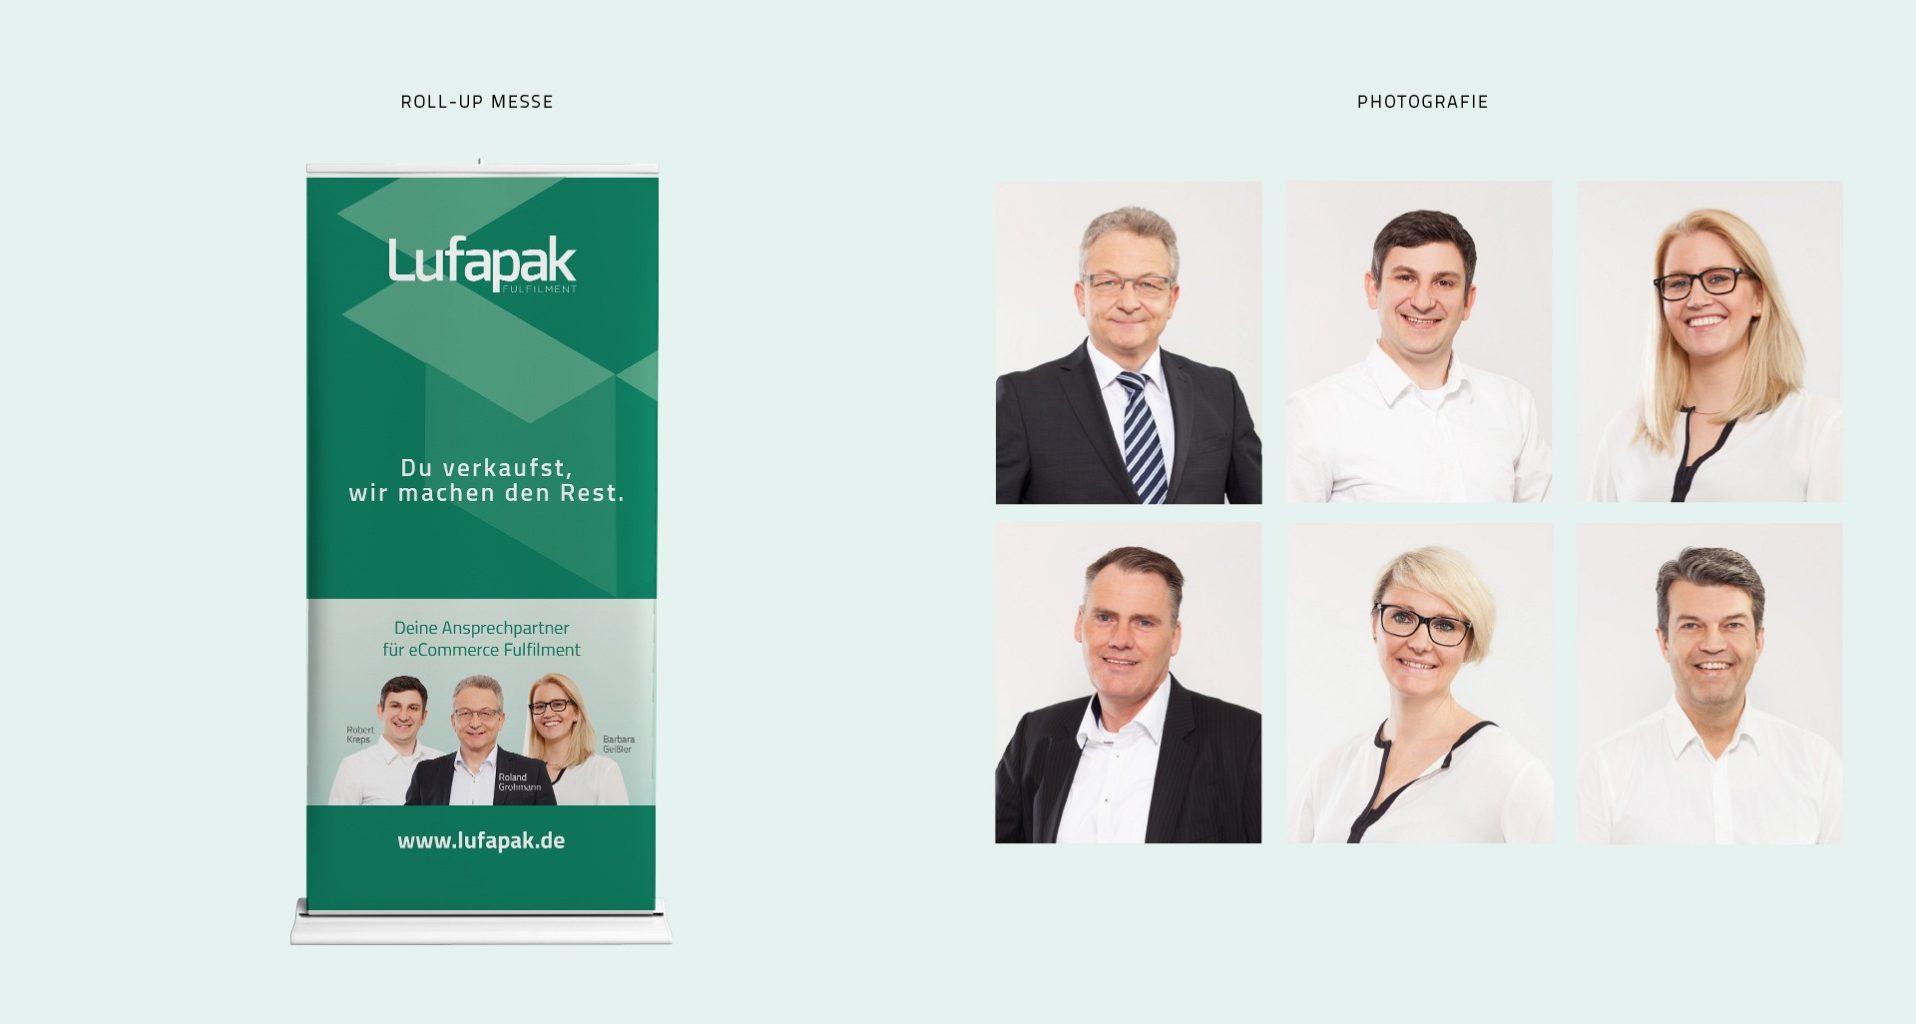 Lufapak-fullfillment-dienstleister-referenz-pictibe-9